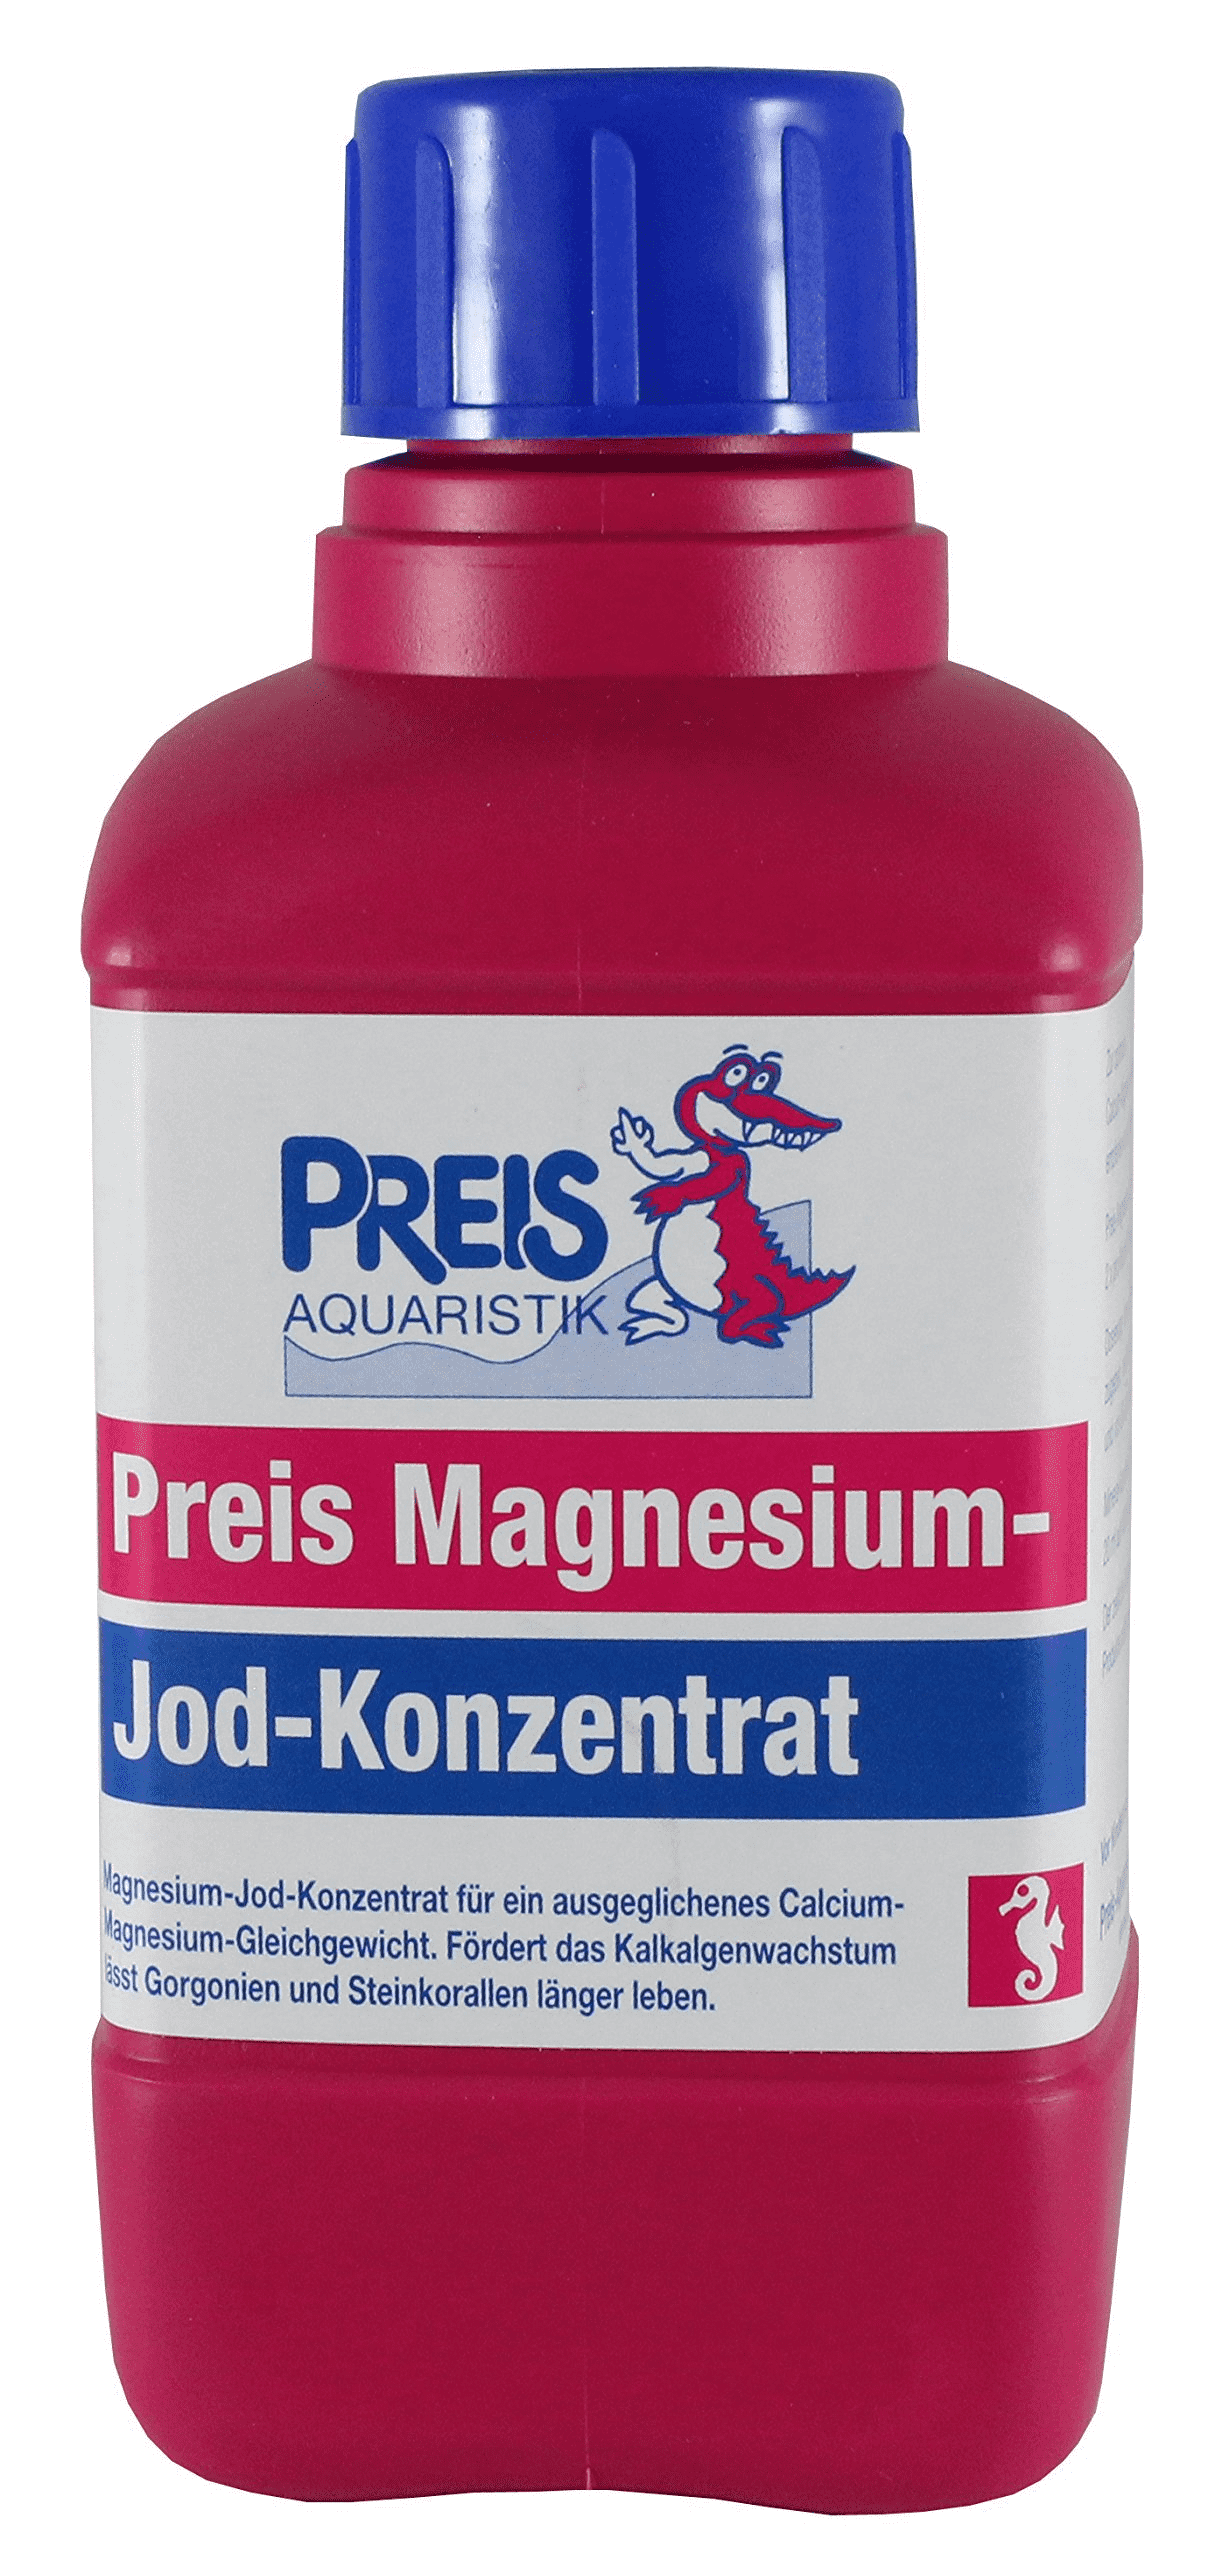 Preis-Magnesium-Jod 250 ml